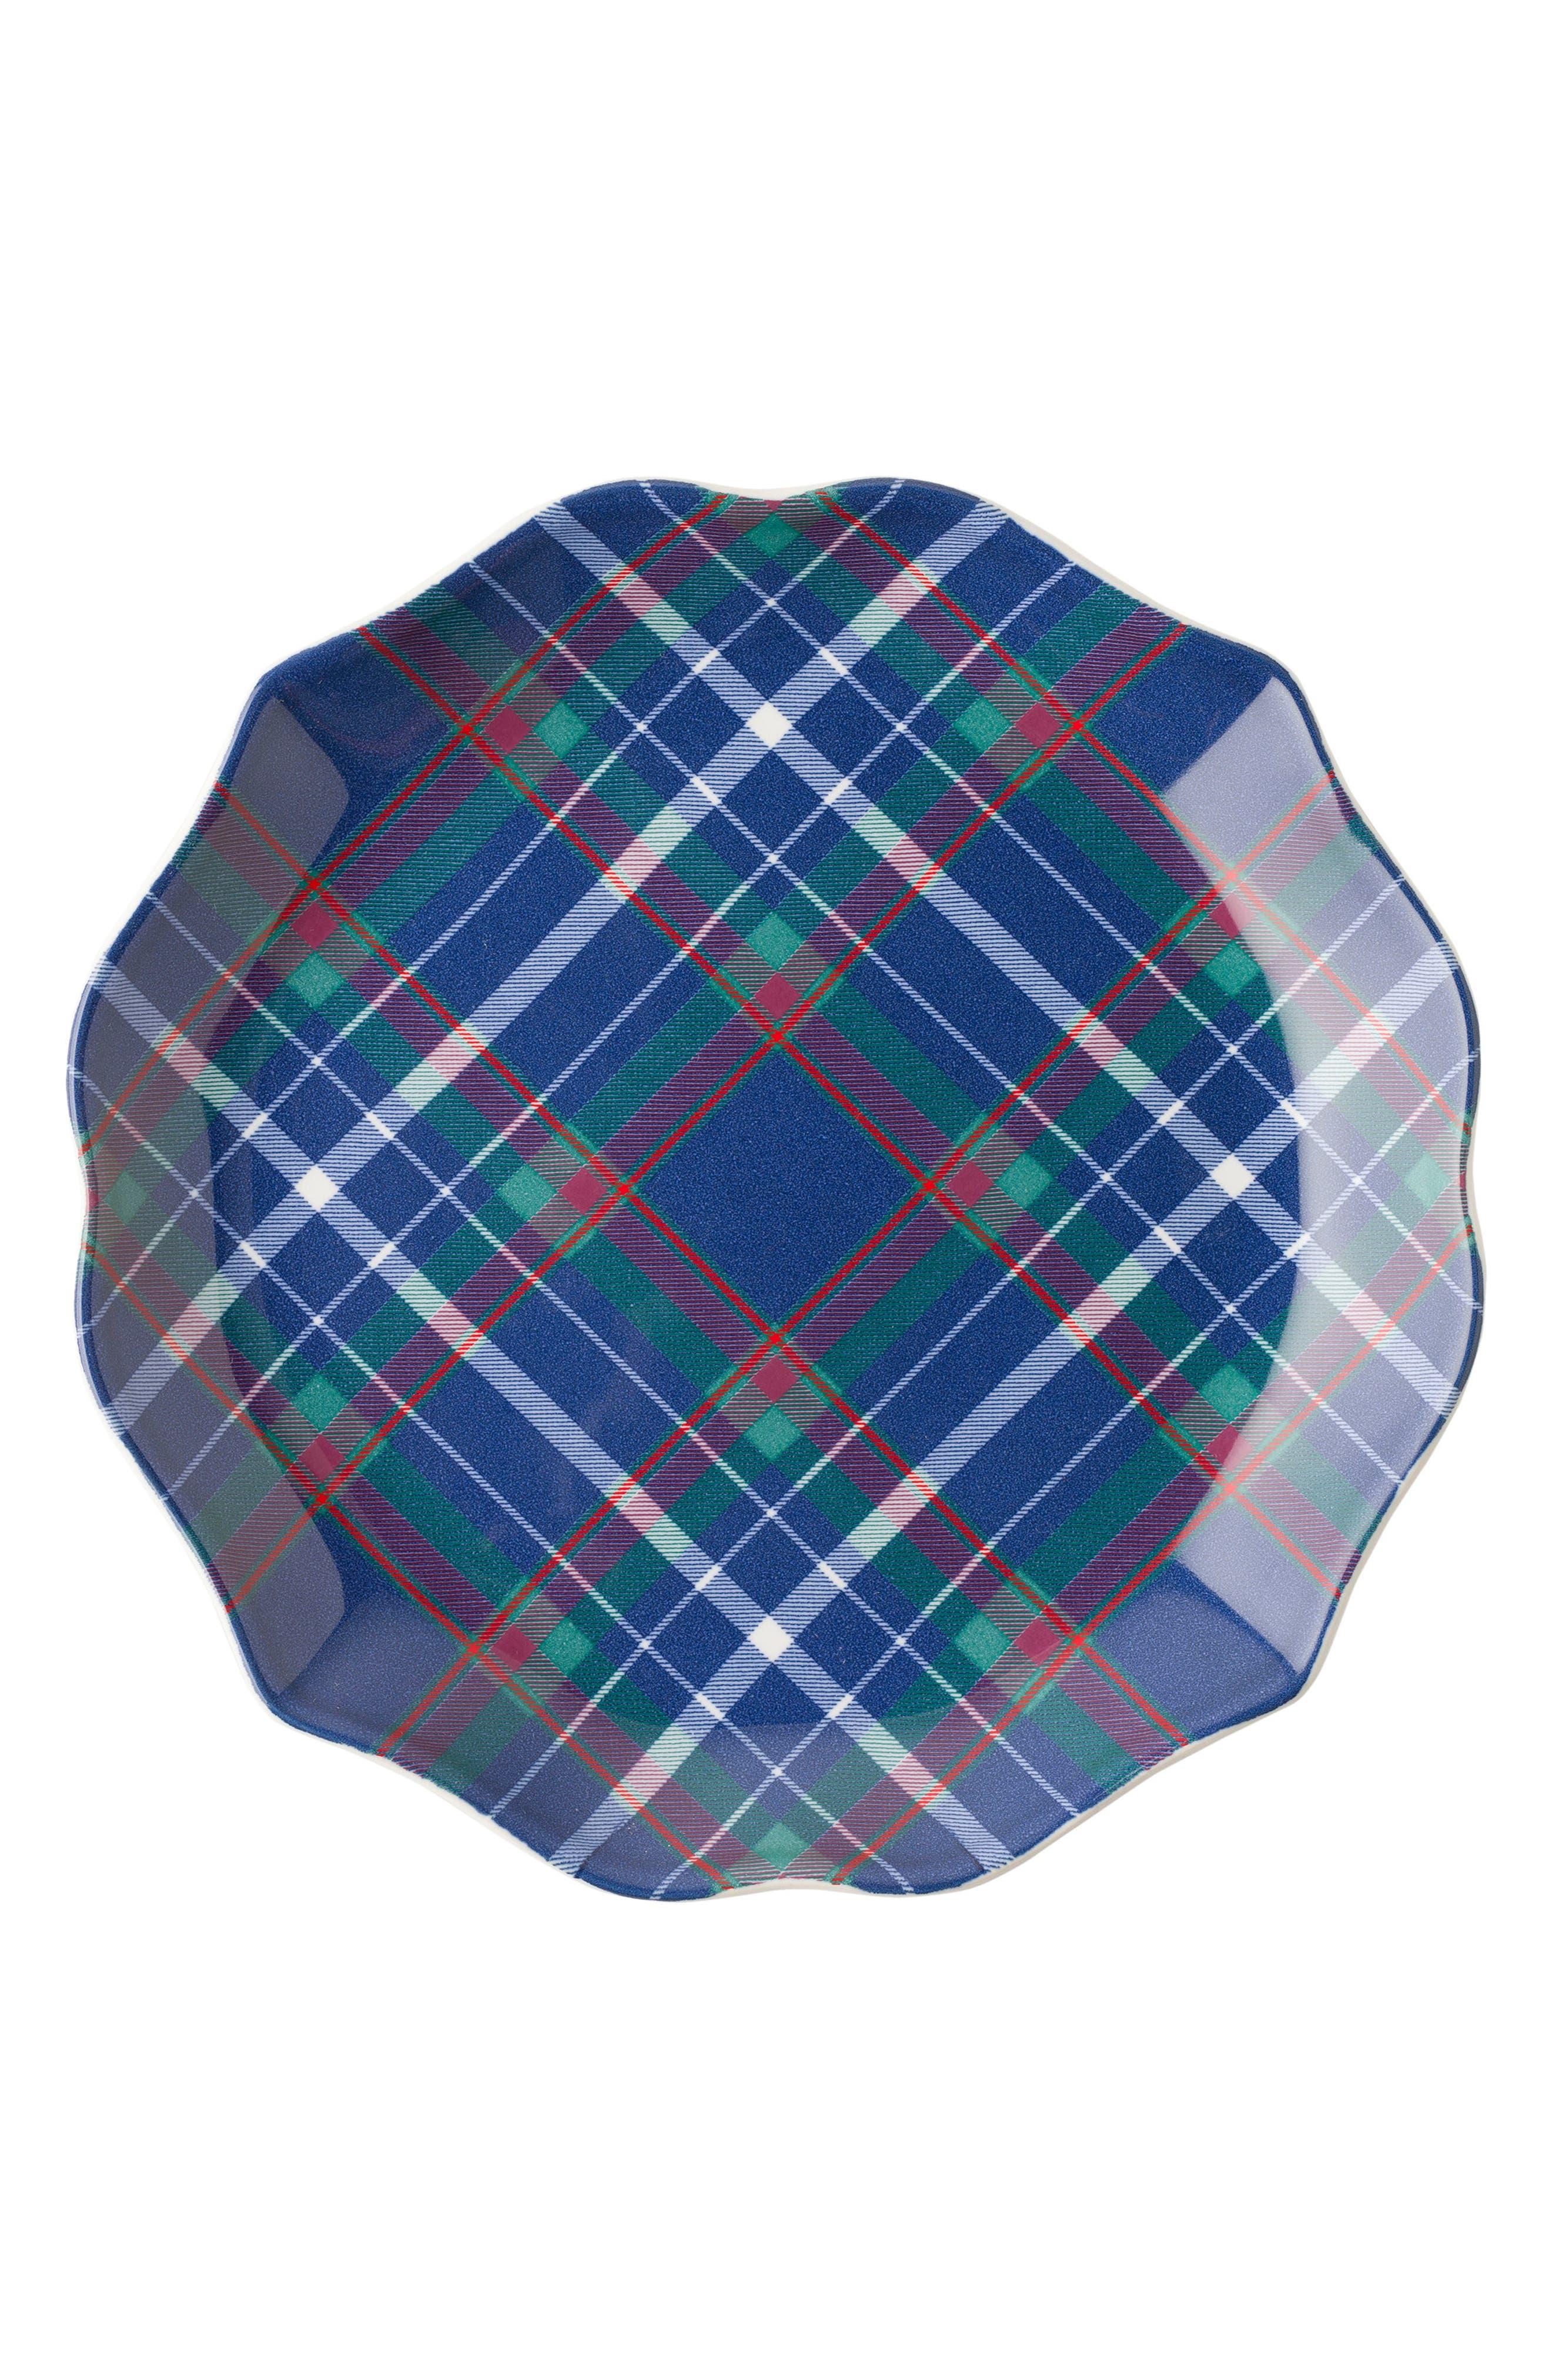 New Traditions - Tartan Tidbit Set of 4 Plates,                             Alternate thumbnail 4, color,                             400